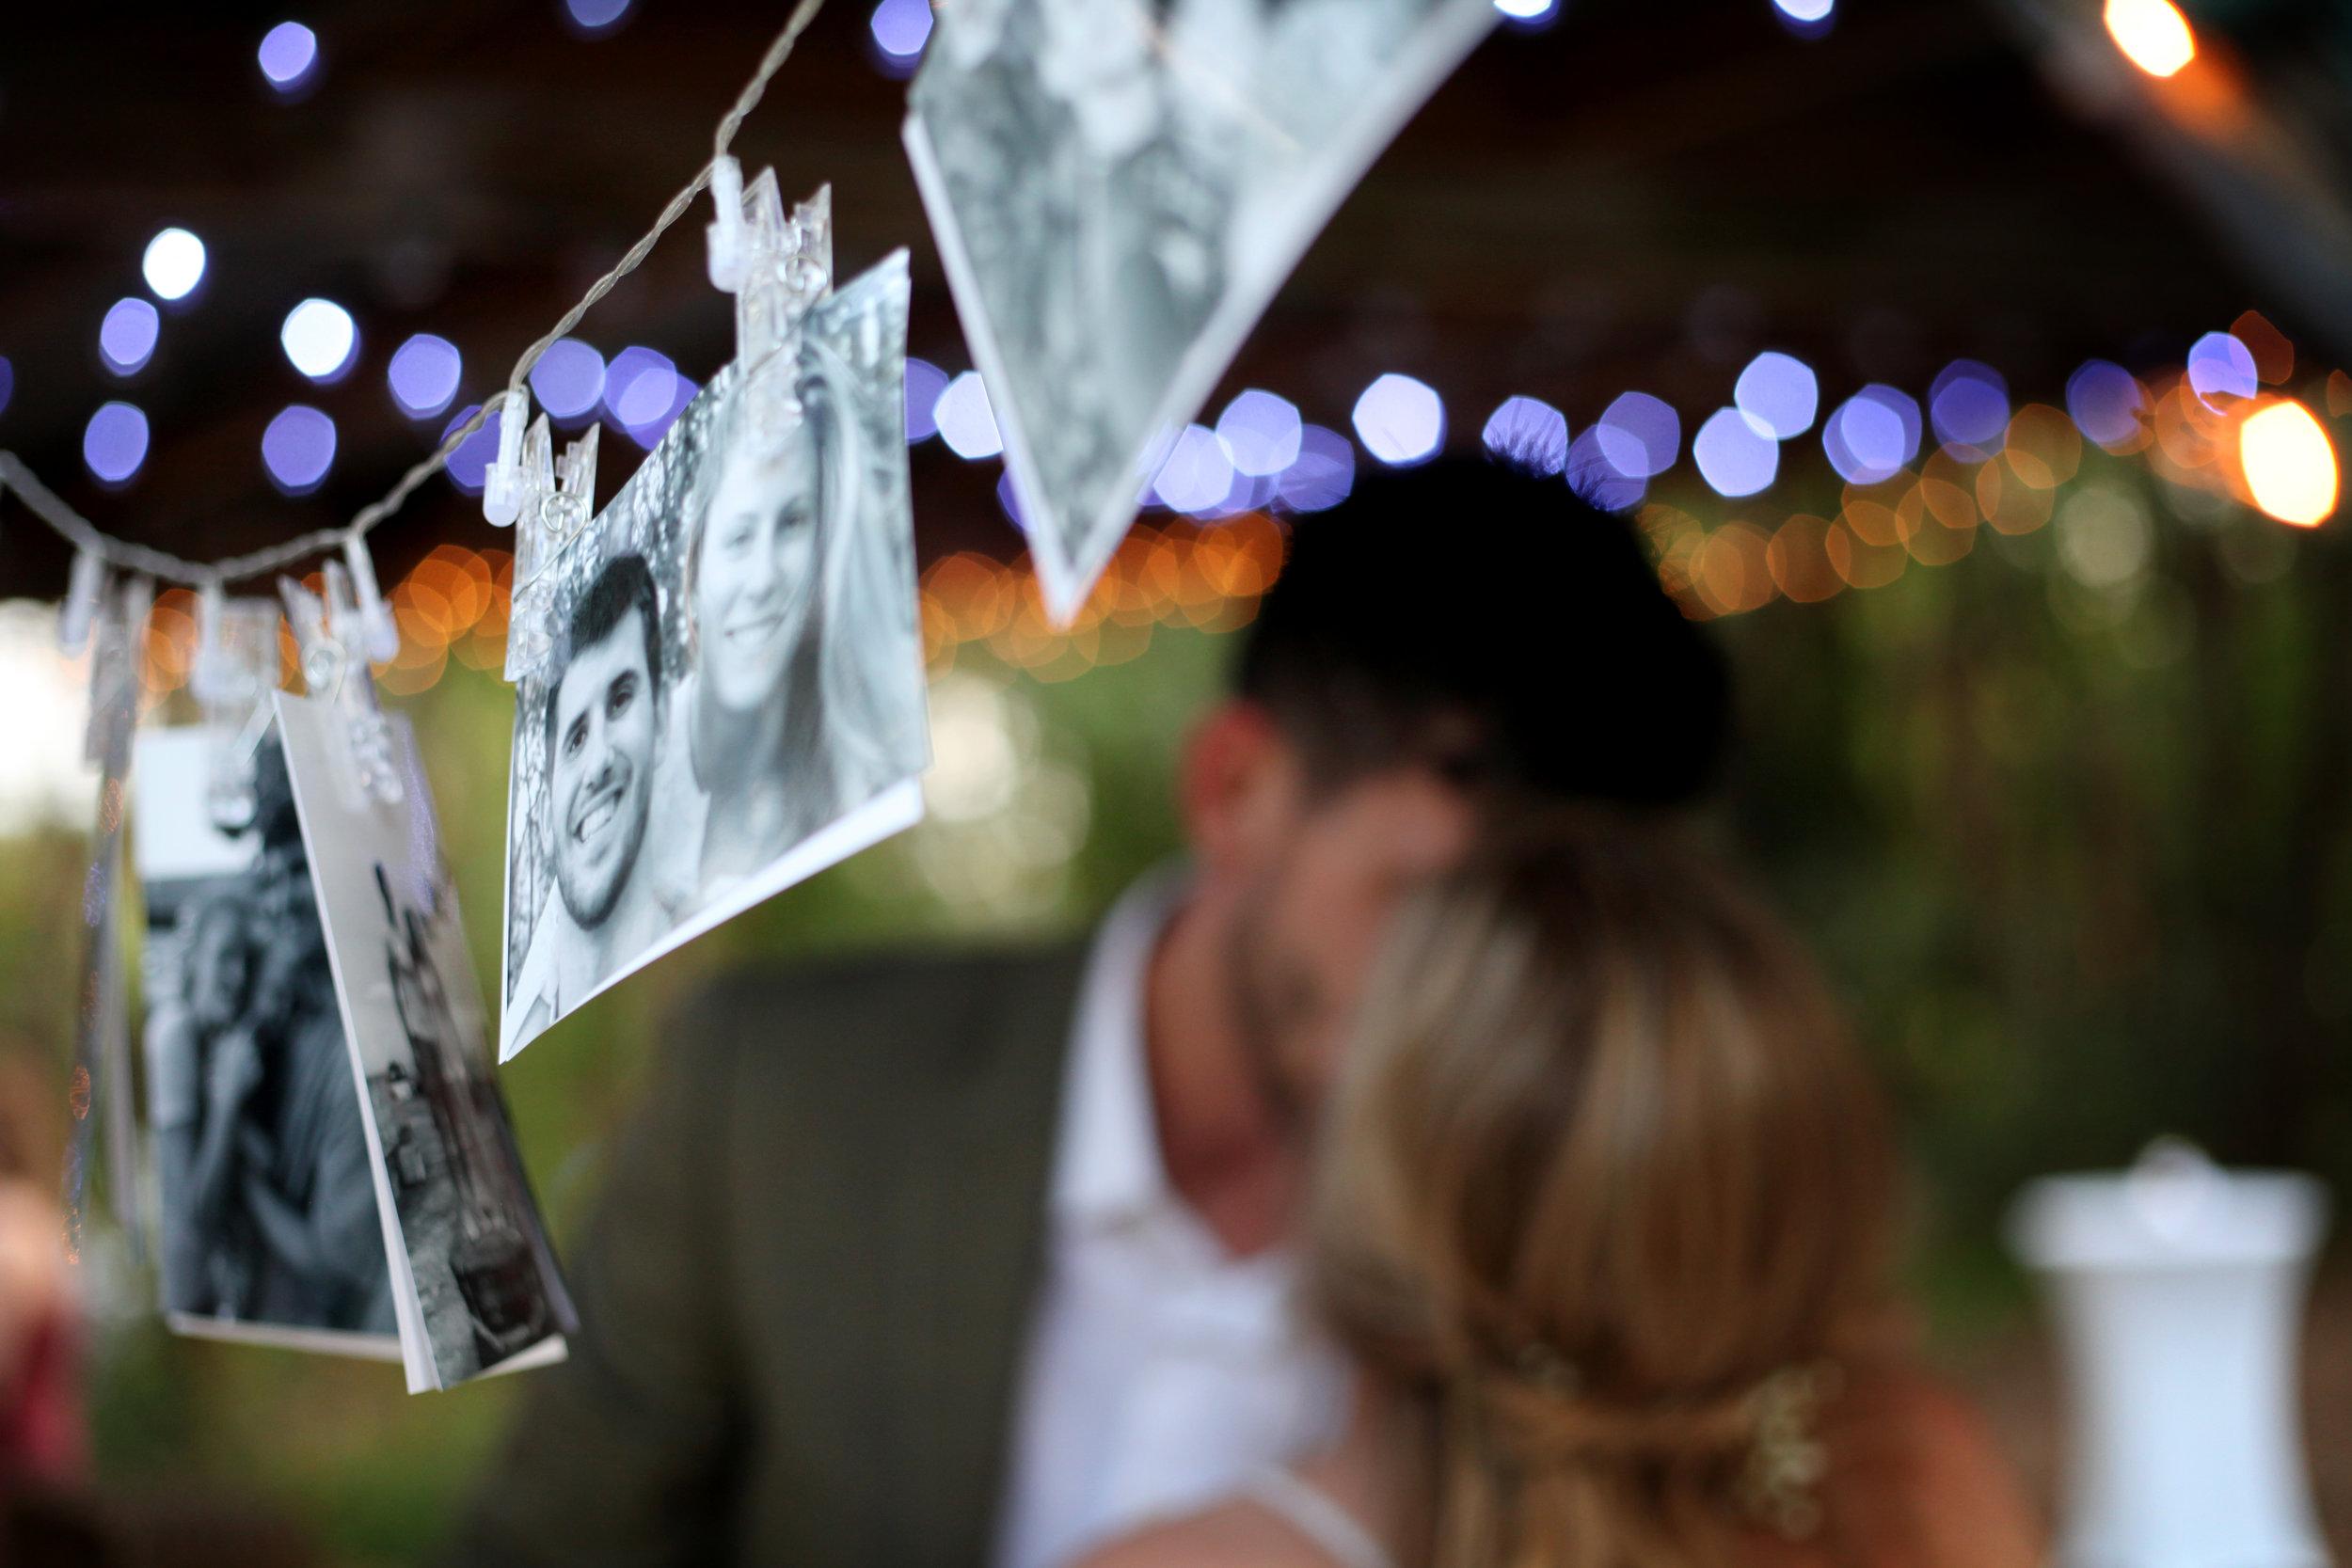 Kiss behind photos